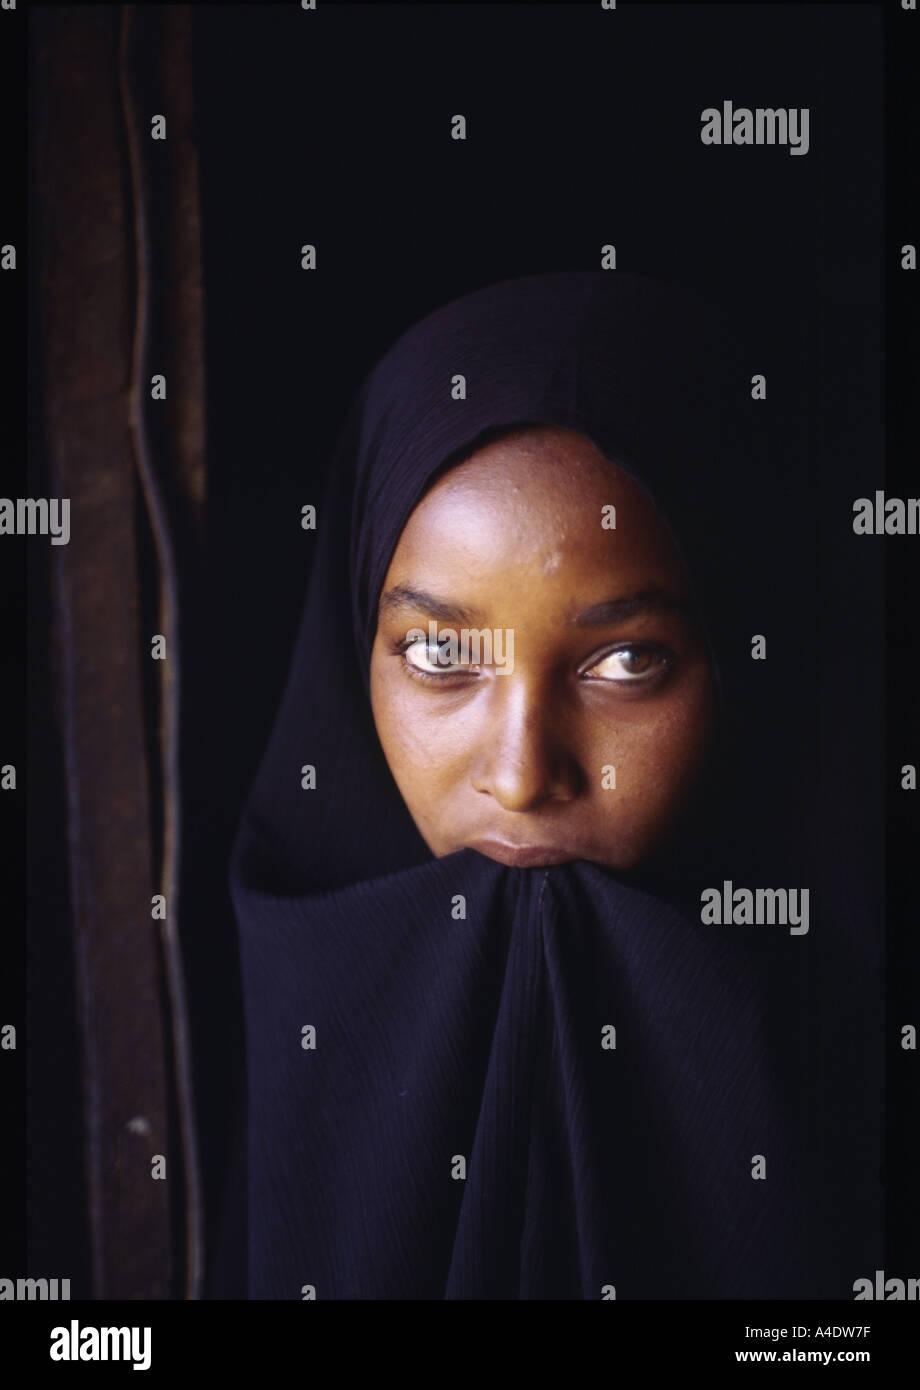 Rencontrer une fille musulmane